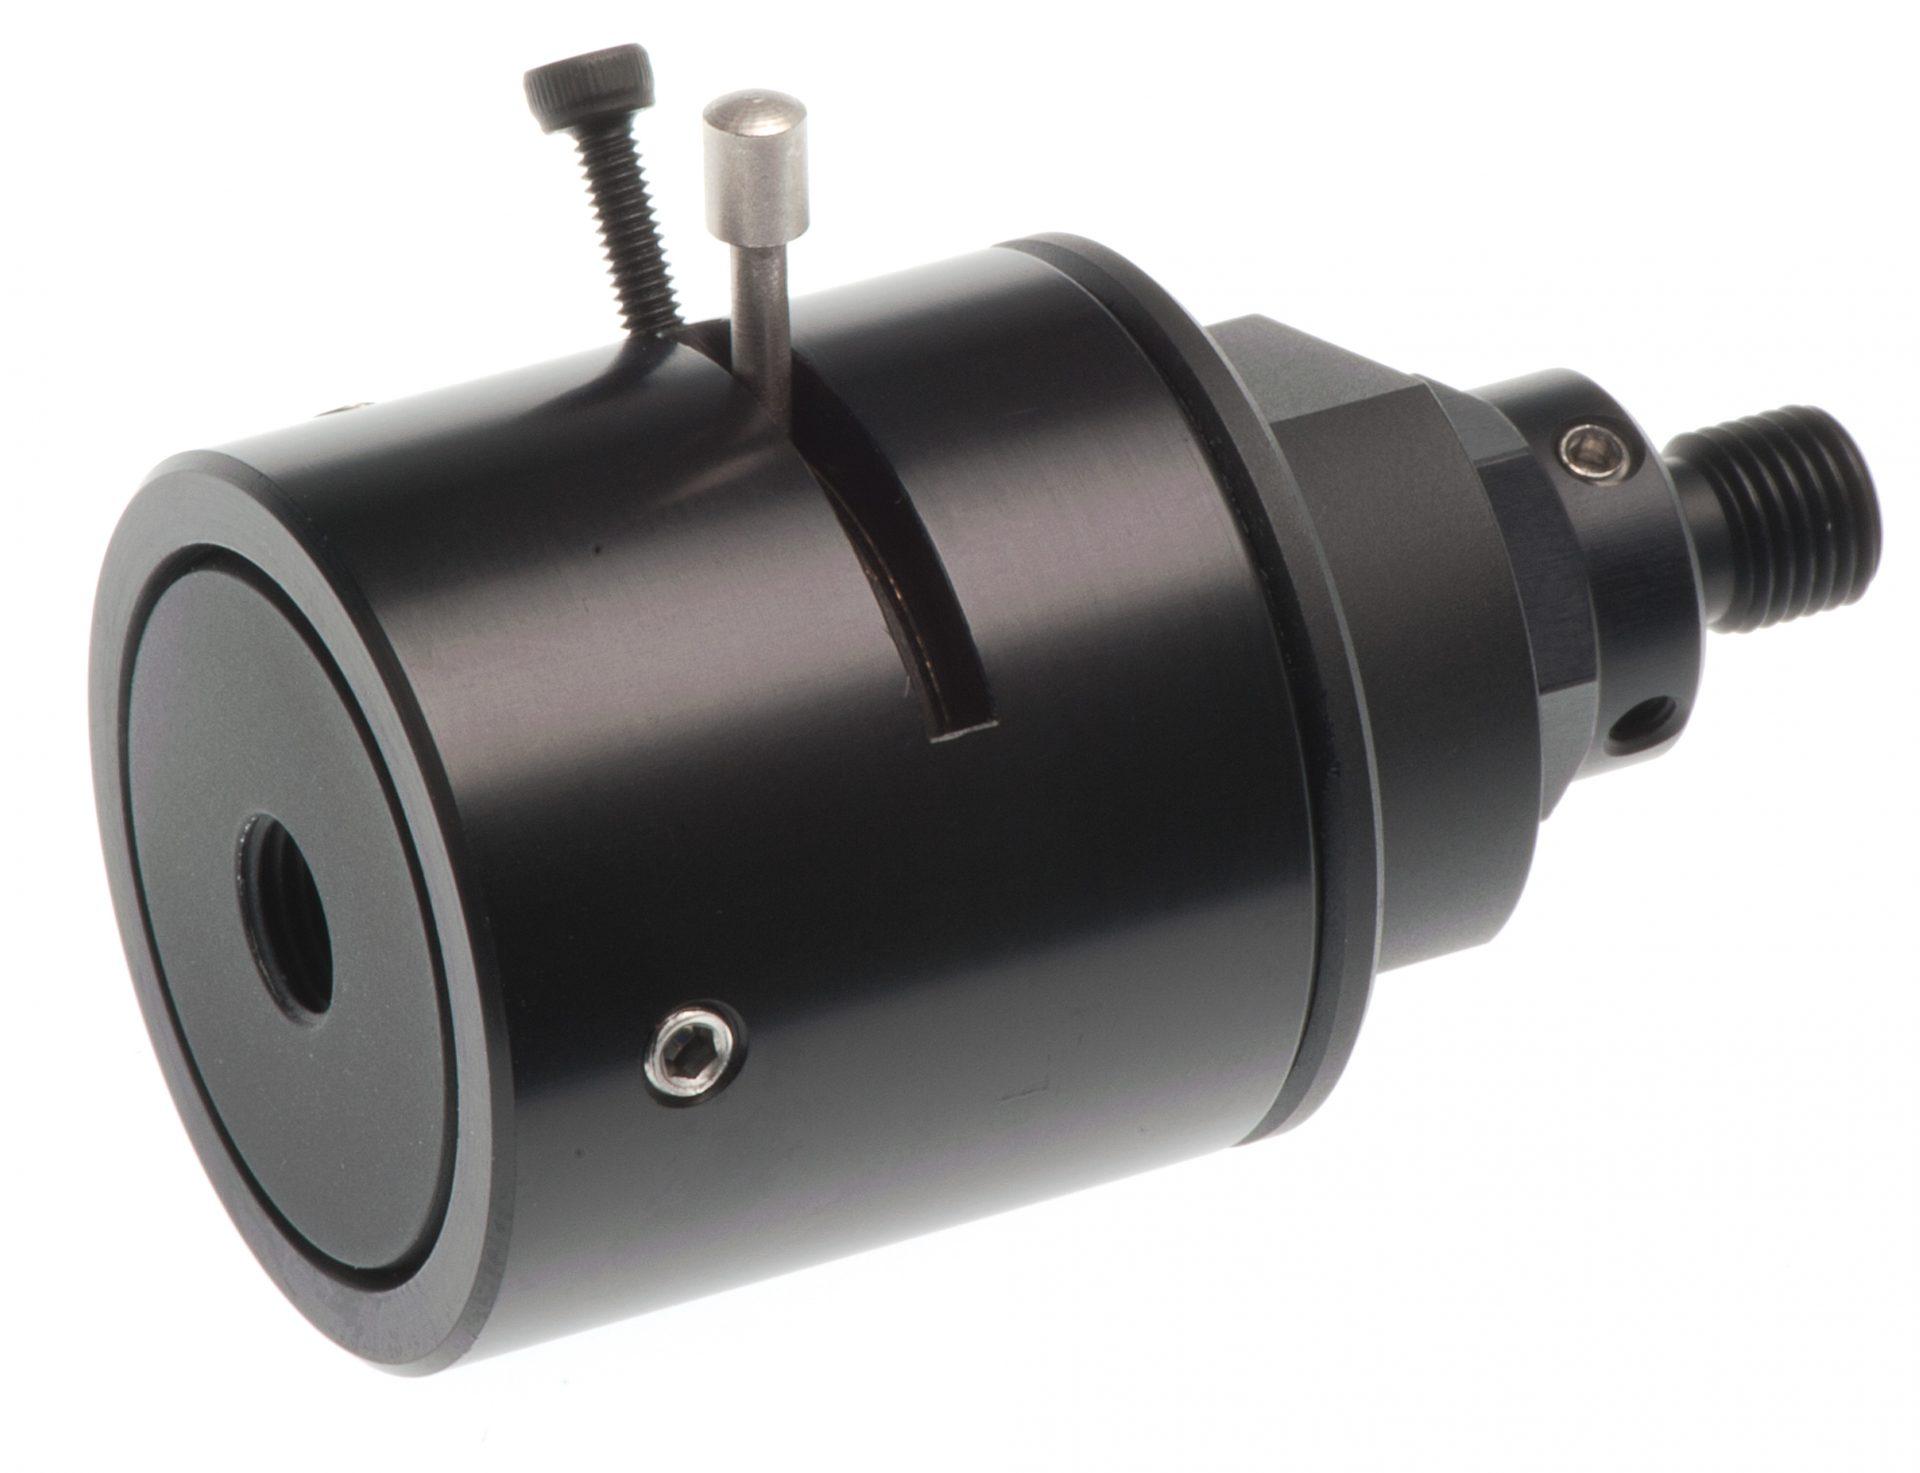 Direct-Attach Fiber-Optic Attenuator - Avantes